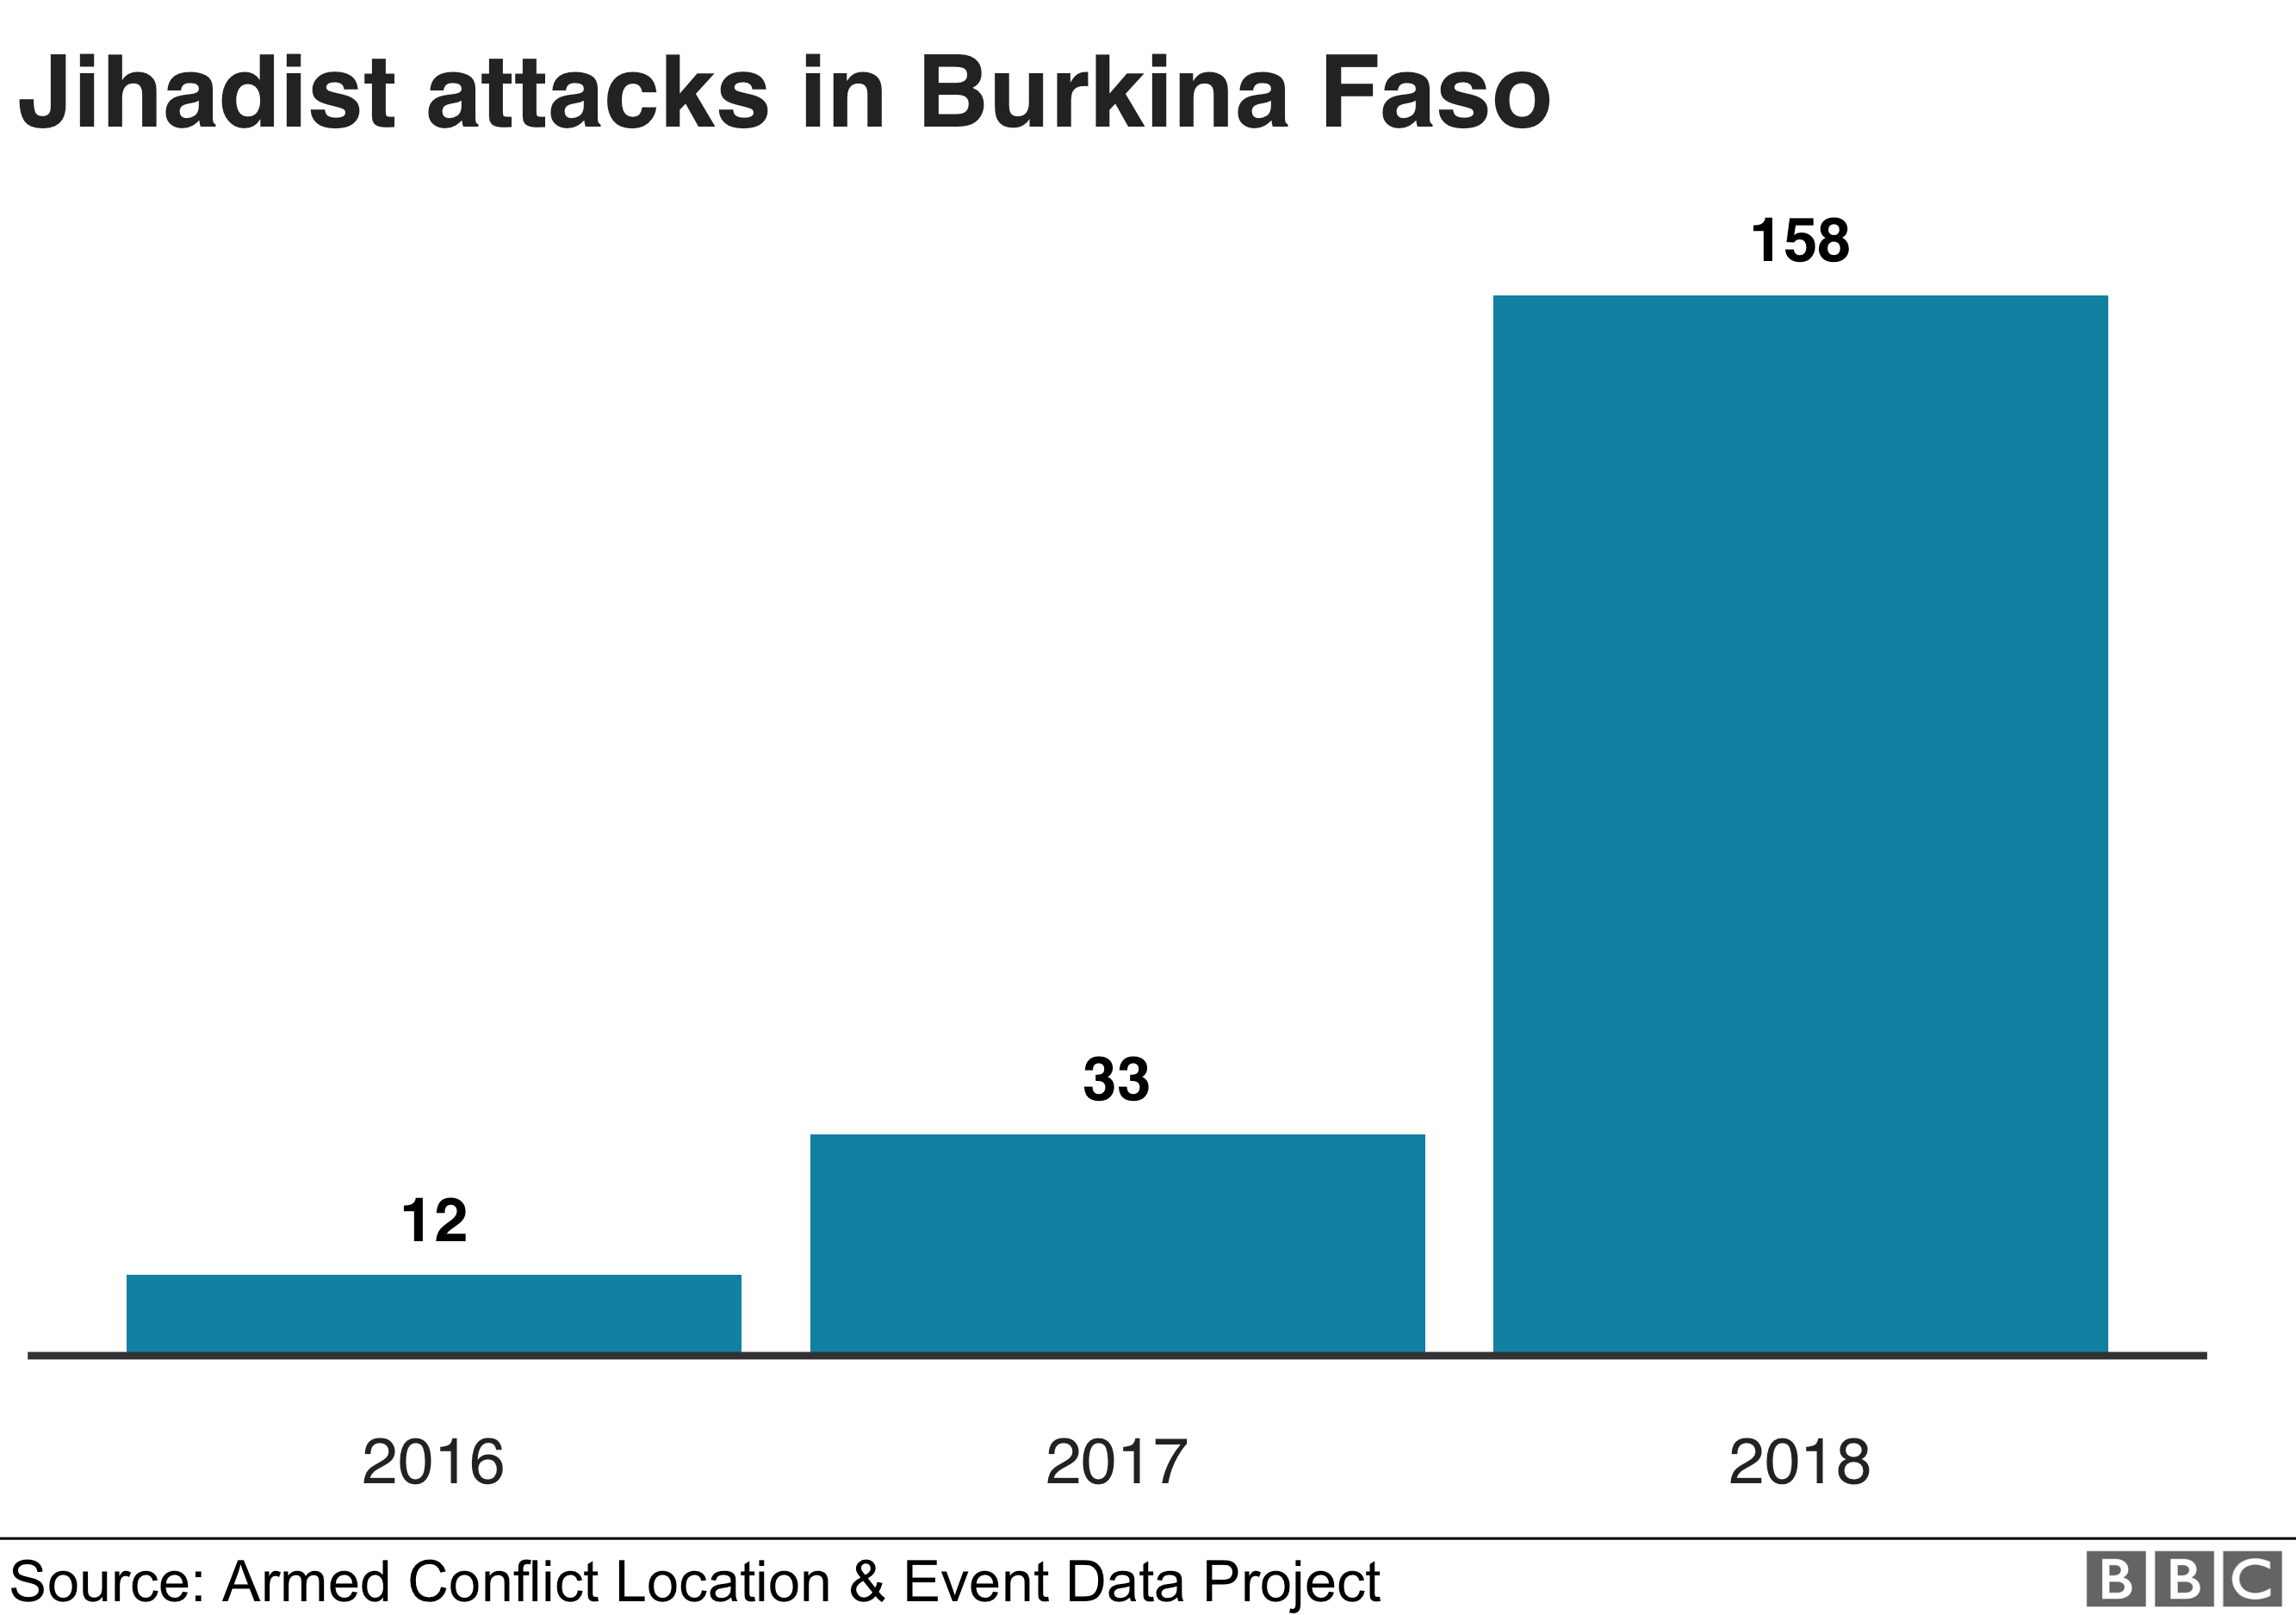 Graphic of jihadist attacks in Burkina Faso